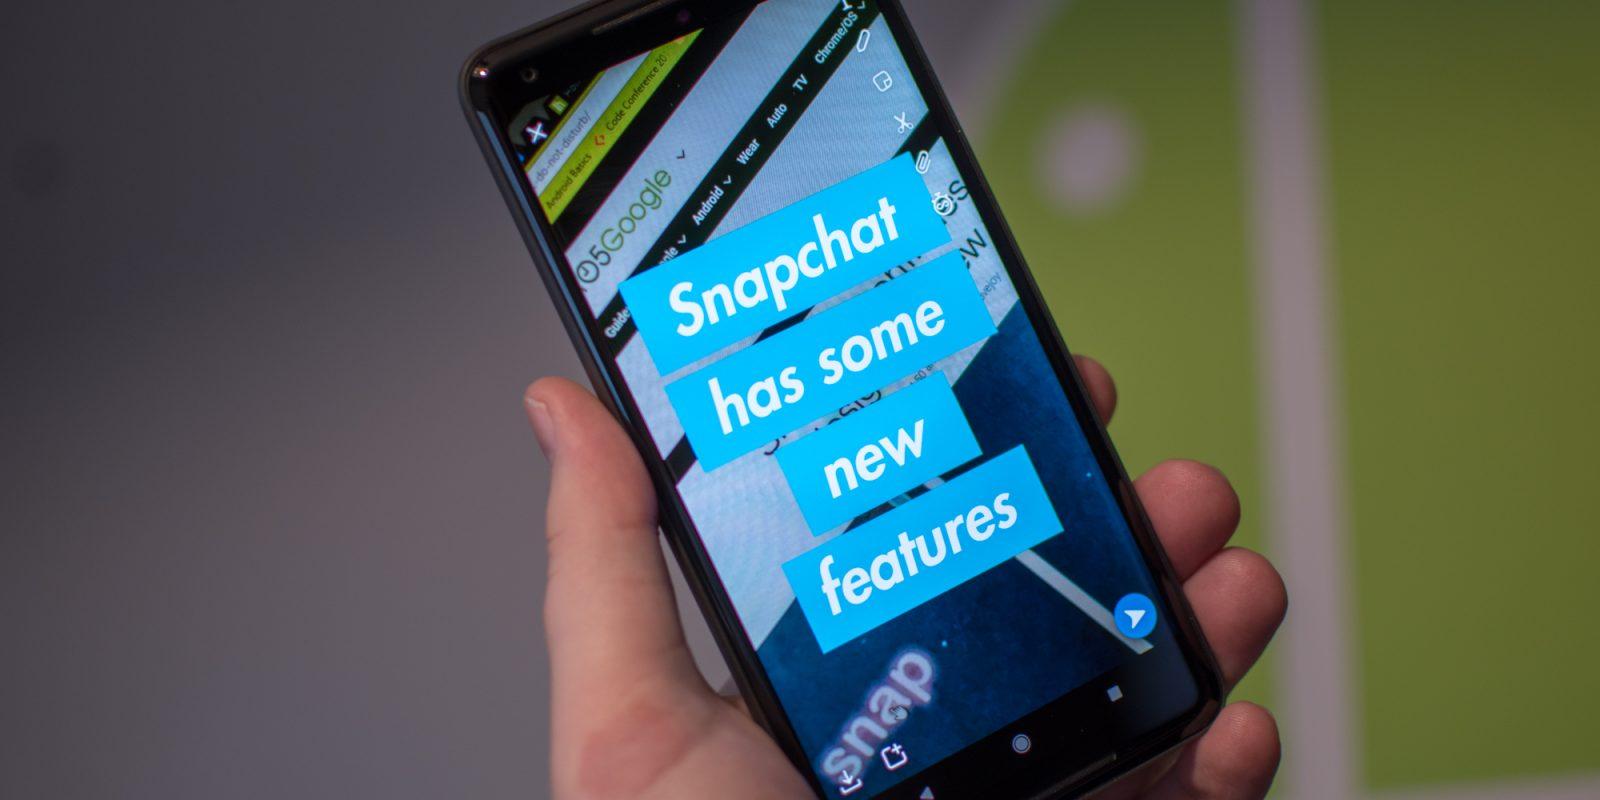 snapchat new text features - كشفت سناب شات عن عدستها الأولى للوجوه التي تتفاعل مع الصوت